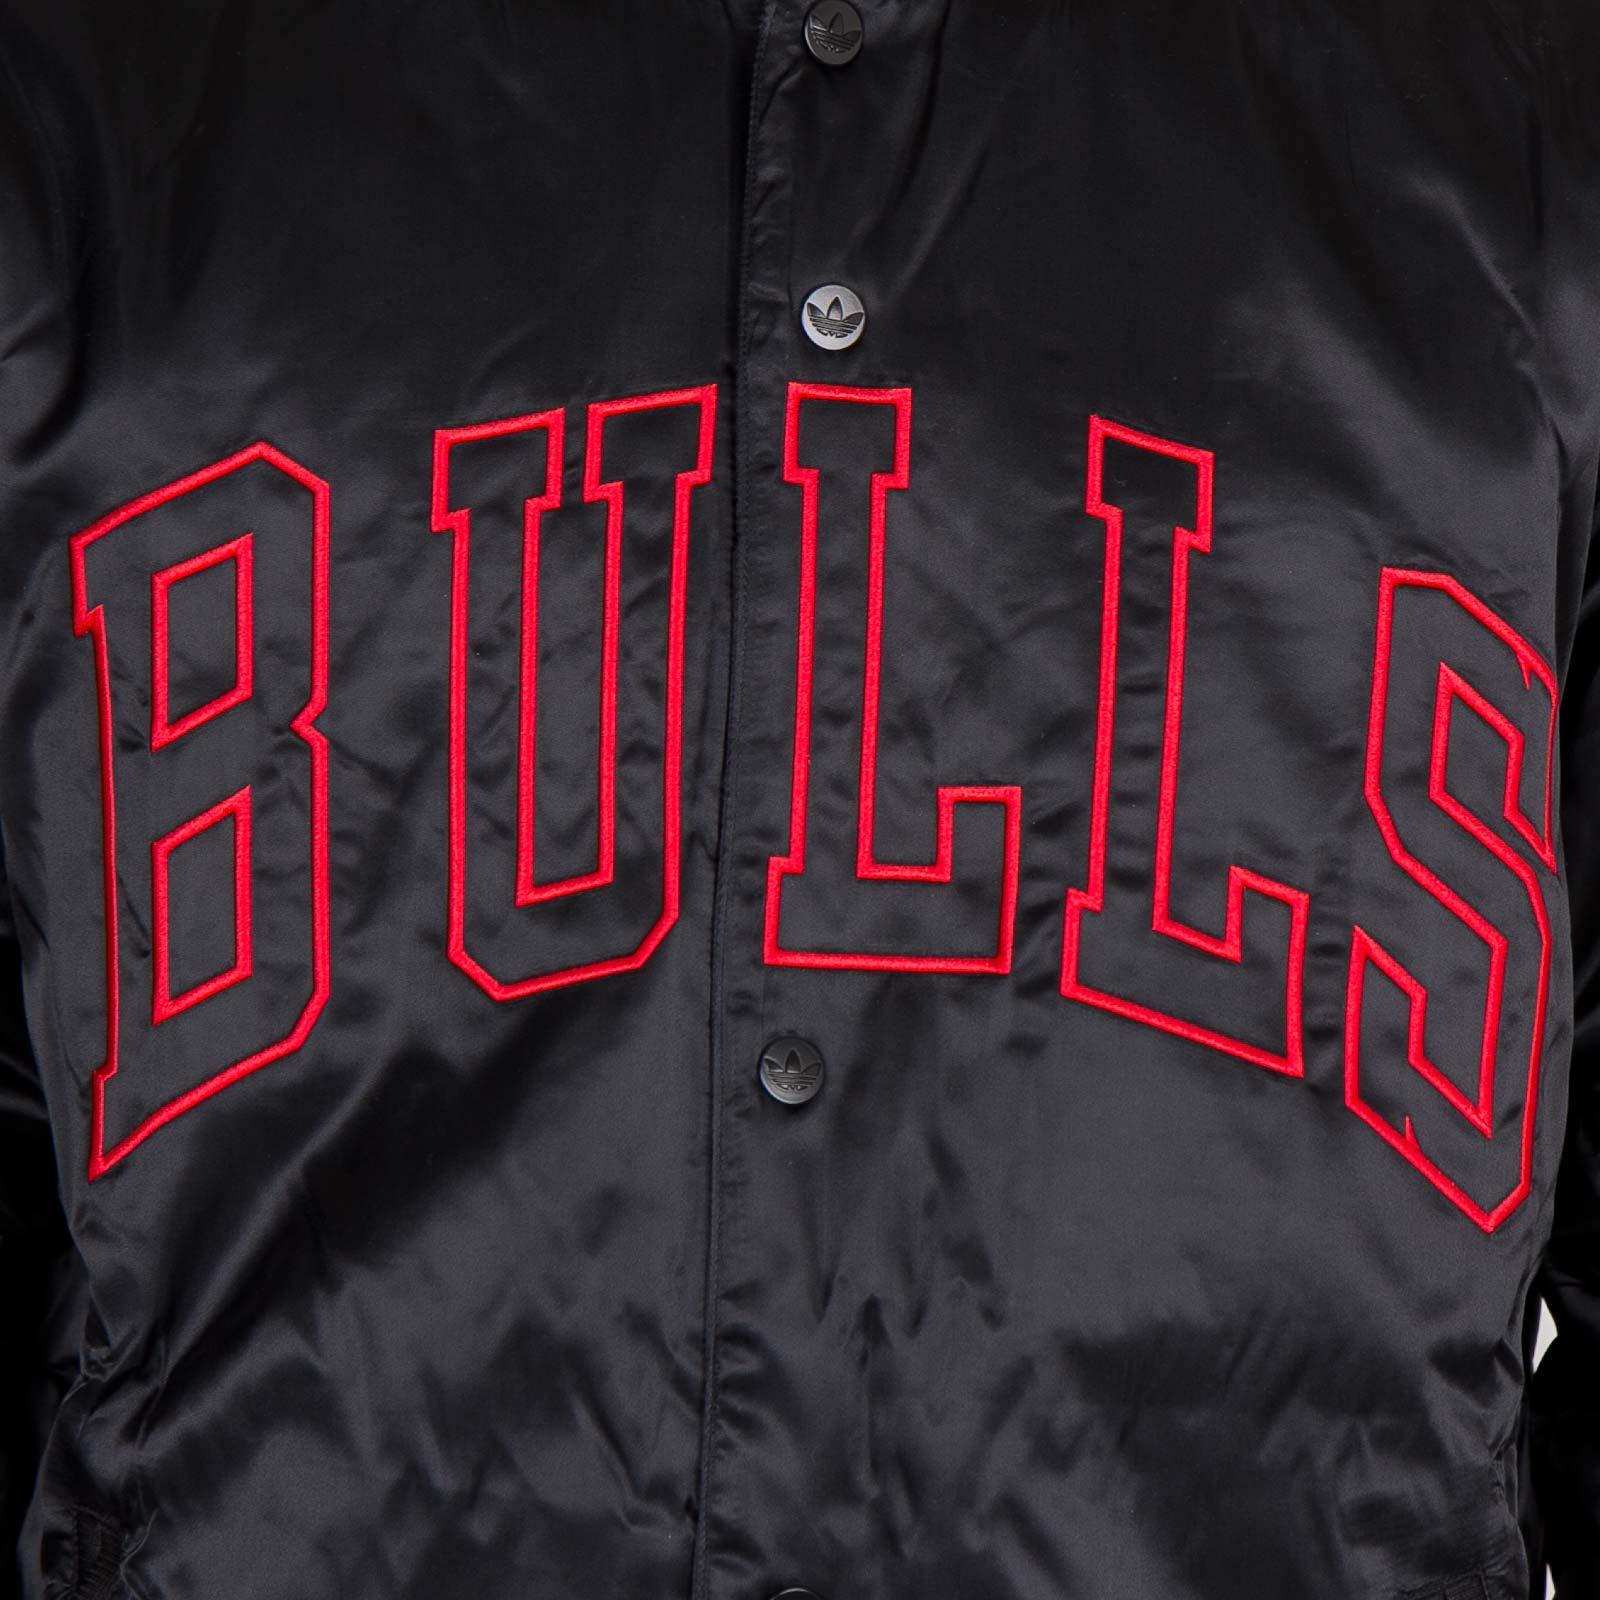 Adidas nba dei chicago bulls in giacca g76317 scarpe da ginnasticanstuff scarpe